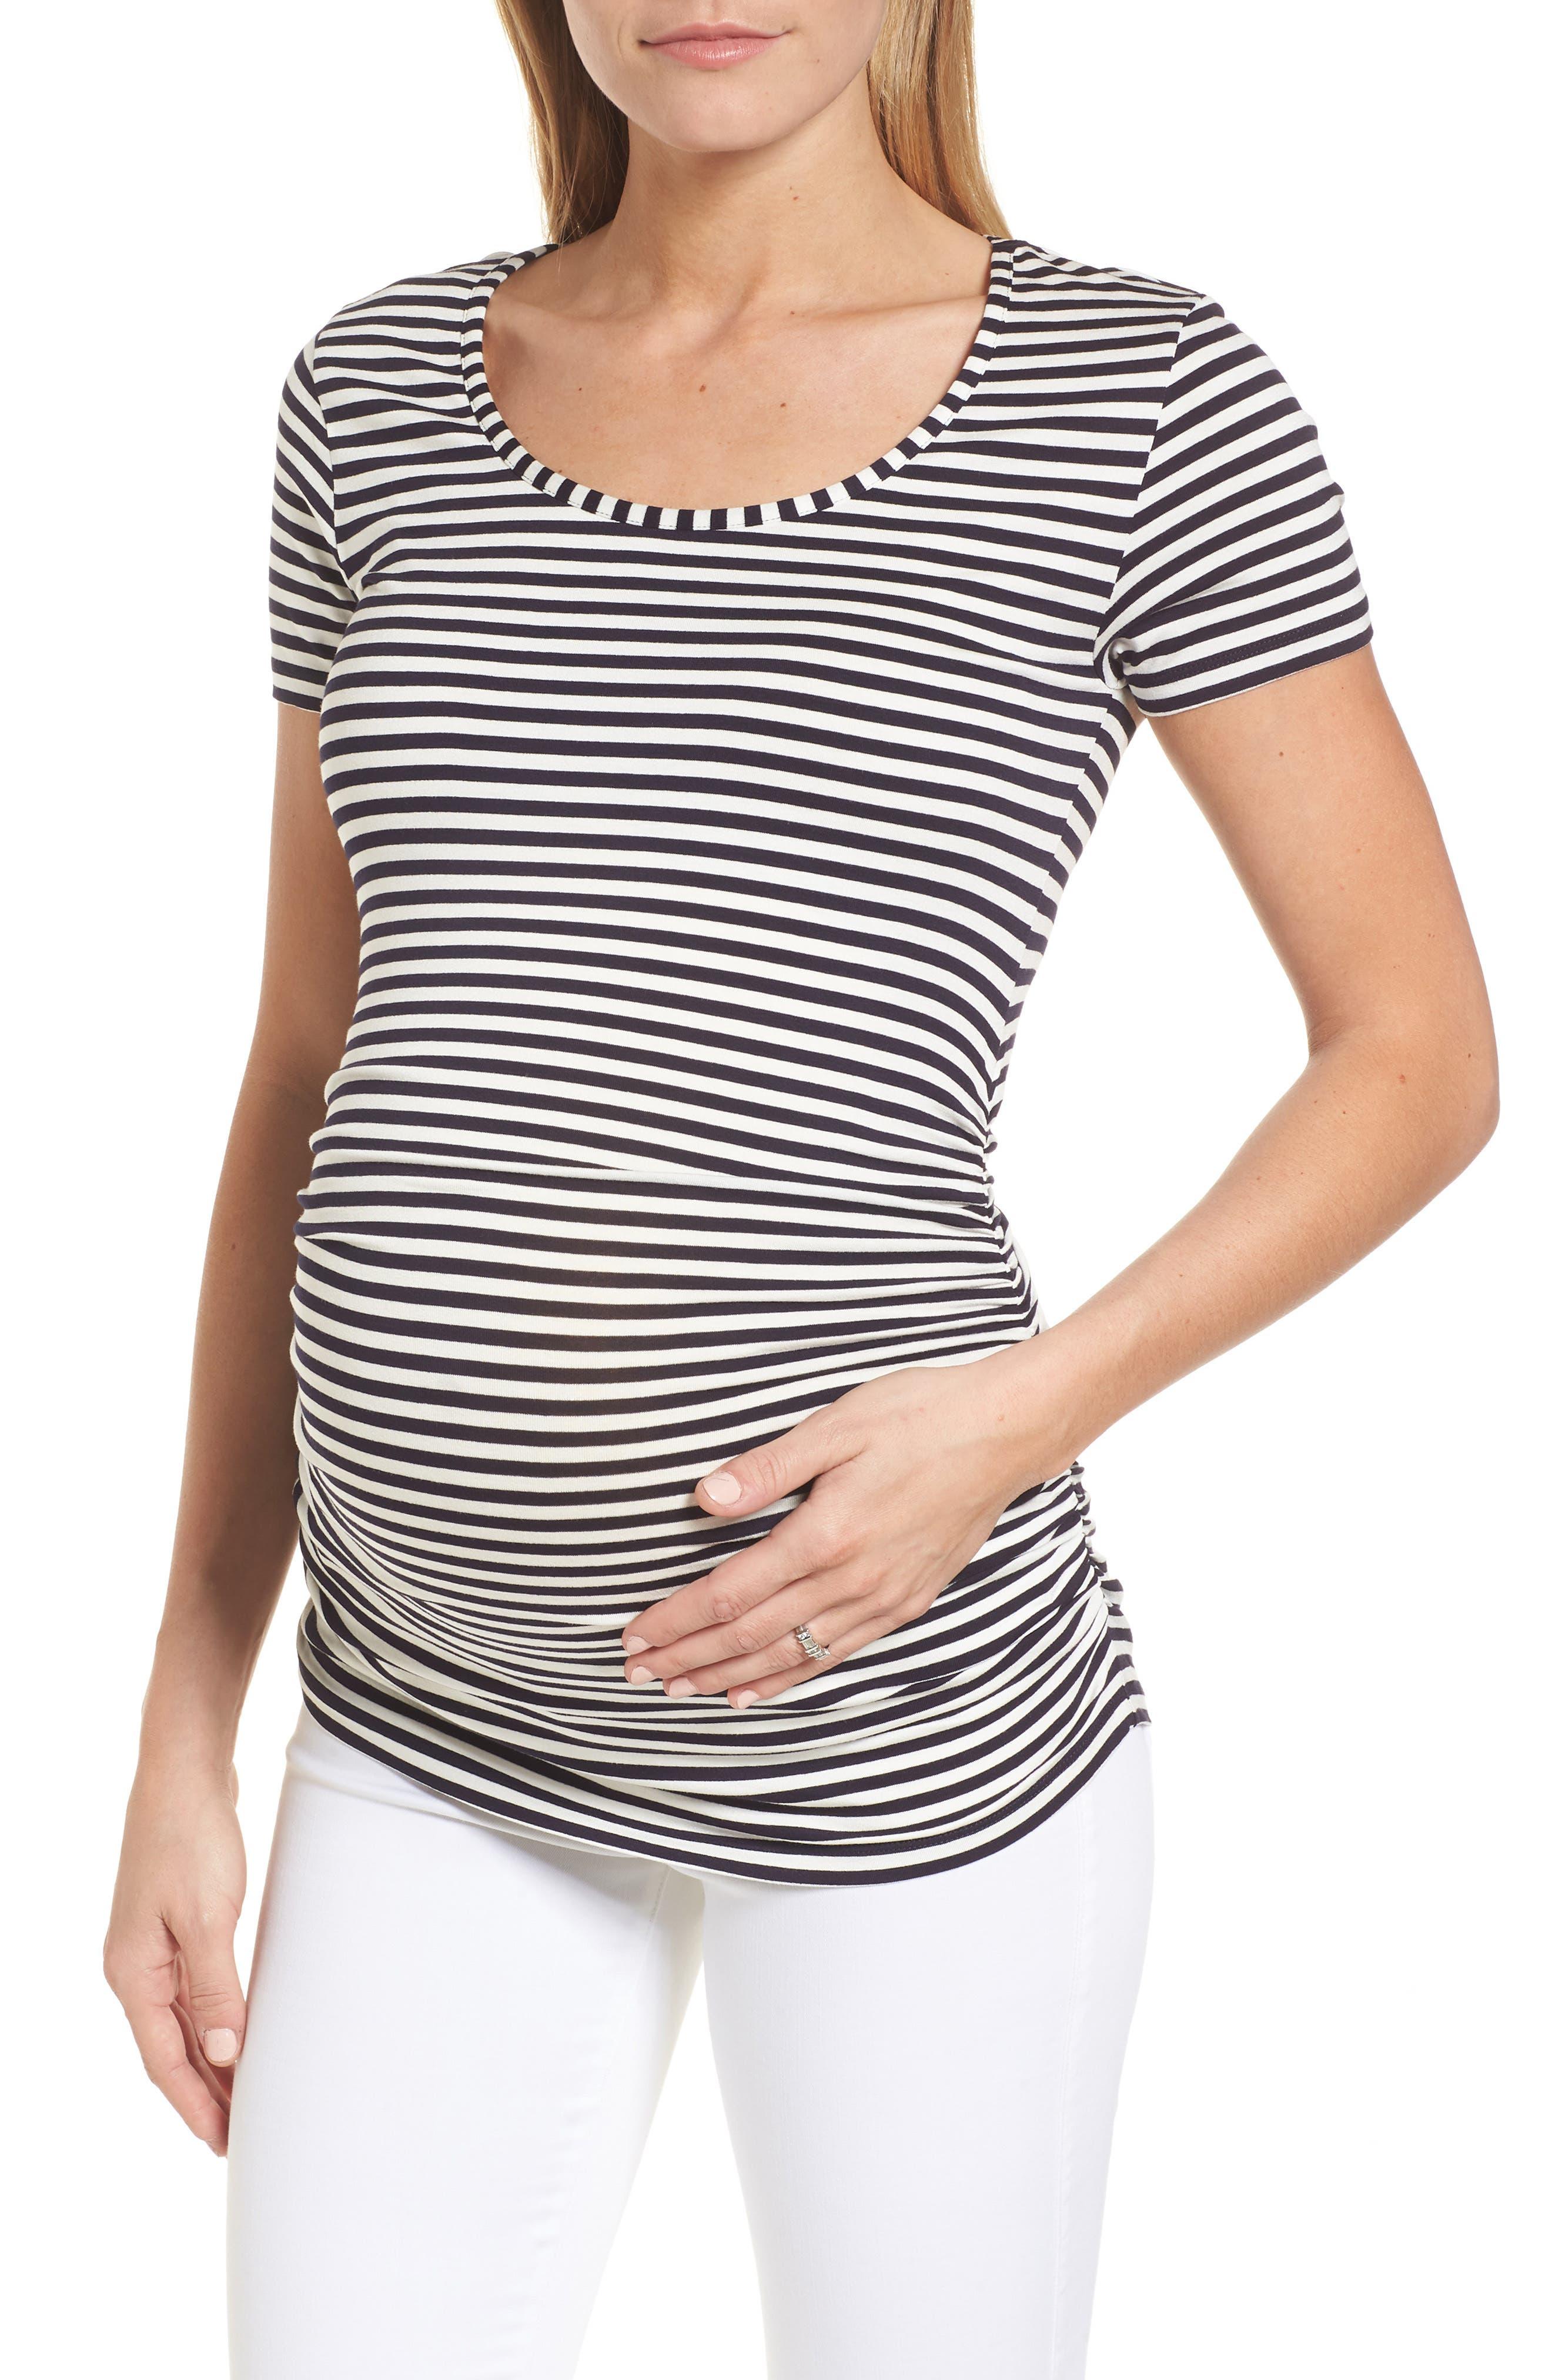 Jenna Maternity Top,                             Main thumbnail 1, color,                             NAVY/OFF WHITE